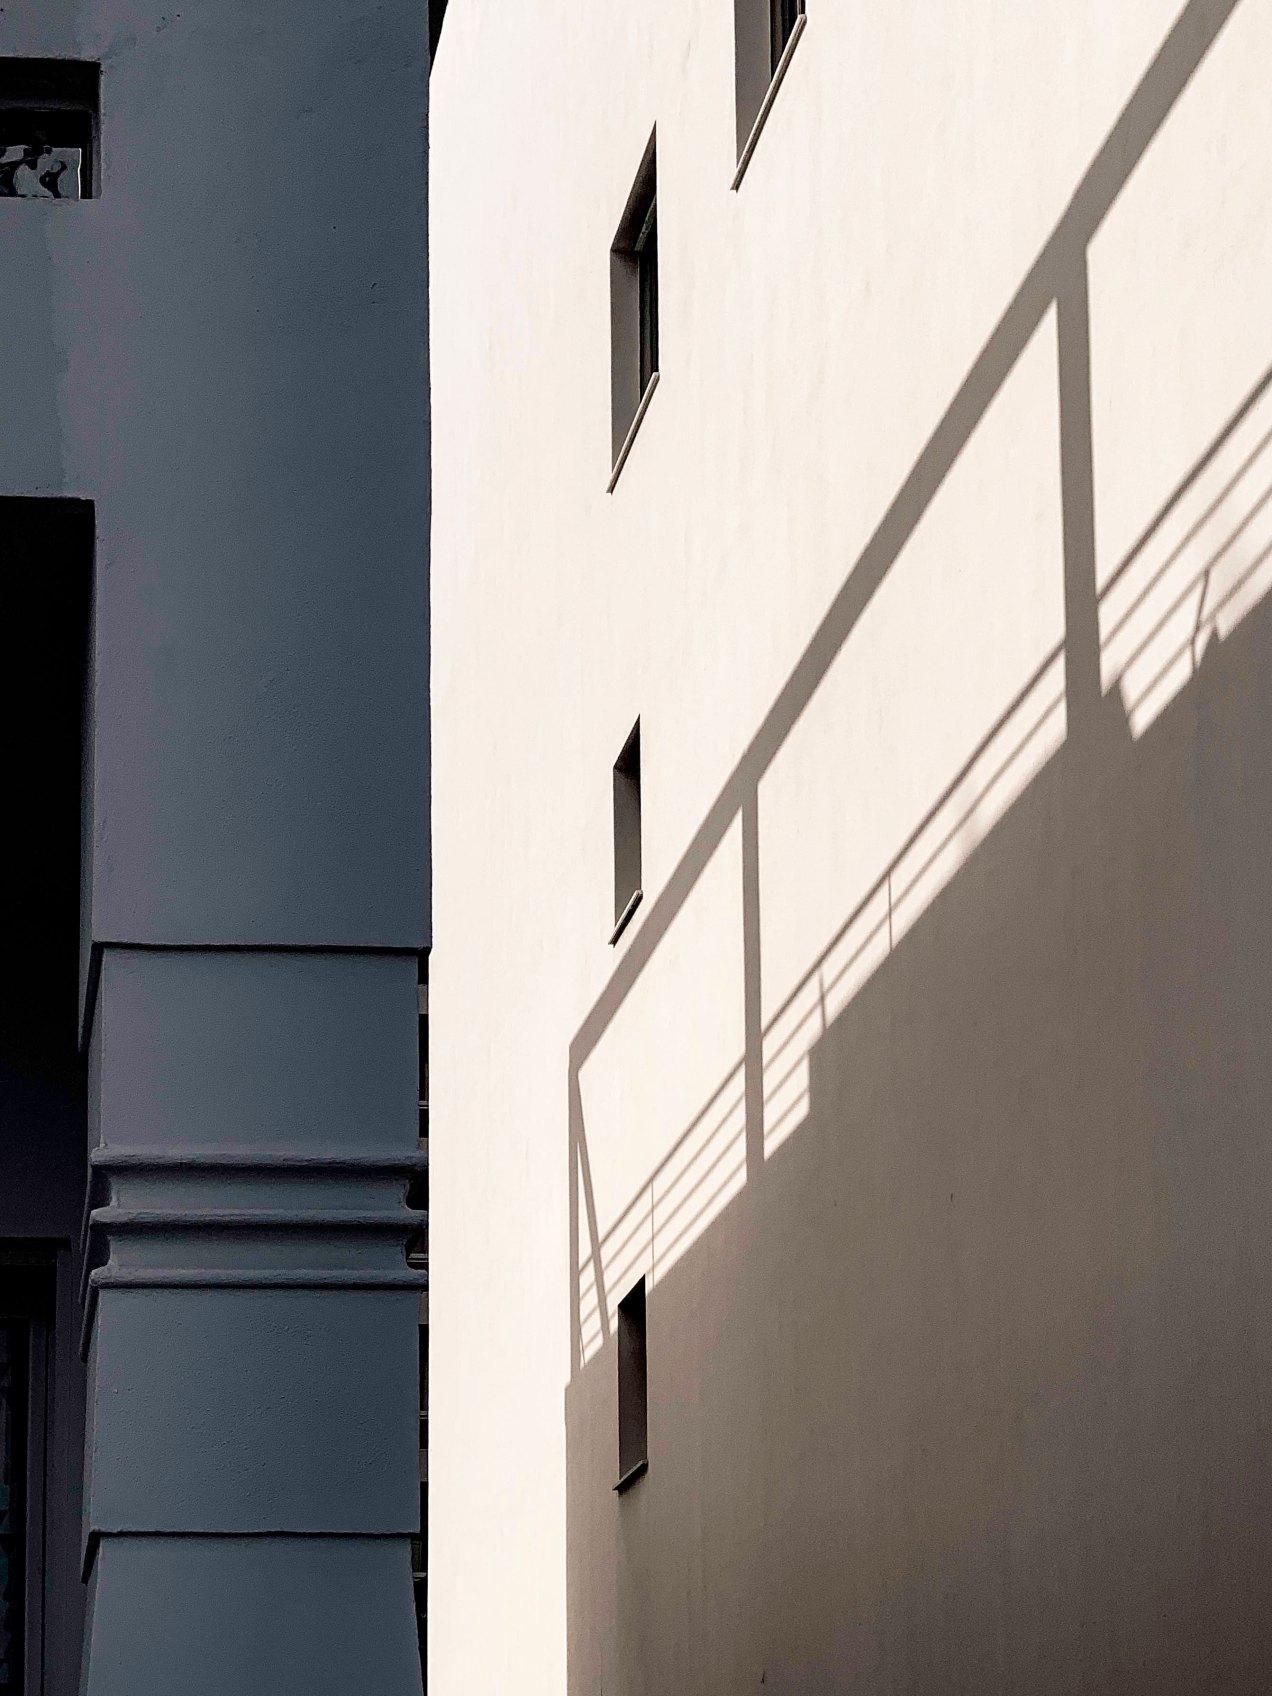 Contraste, promenade des anglais, gildalliere, 2019